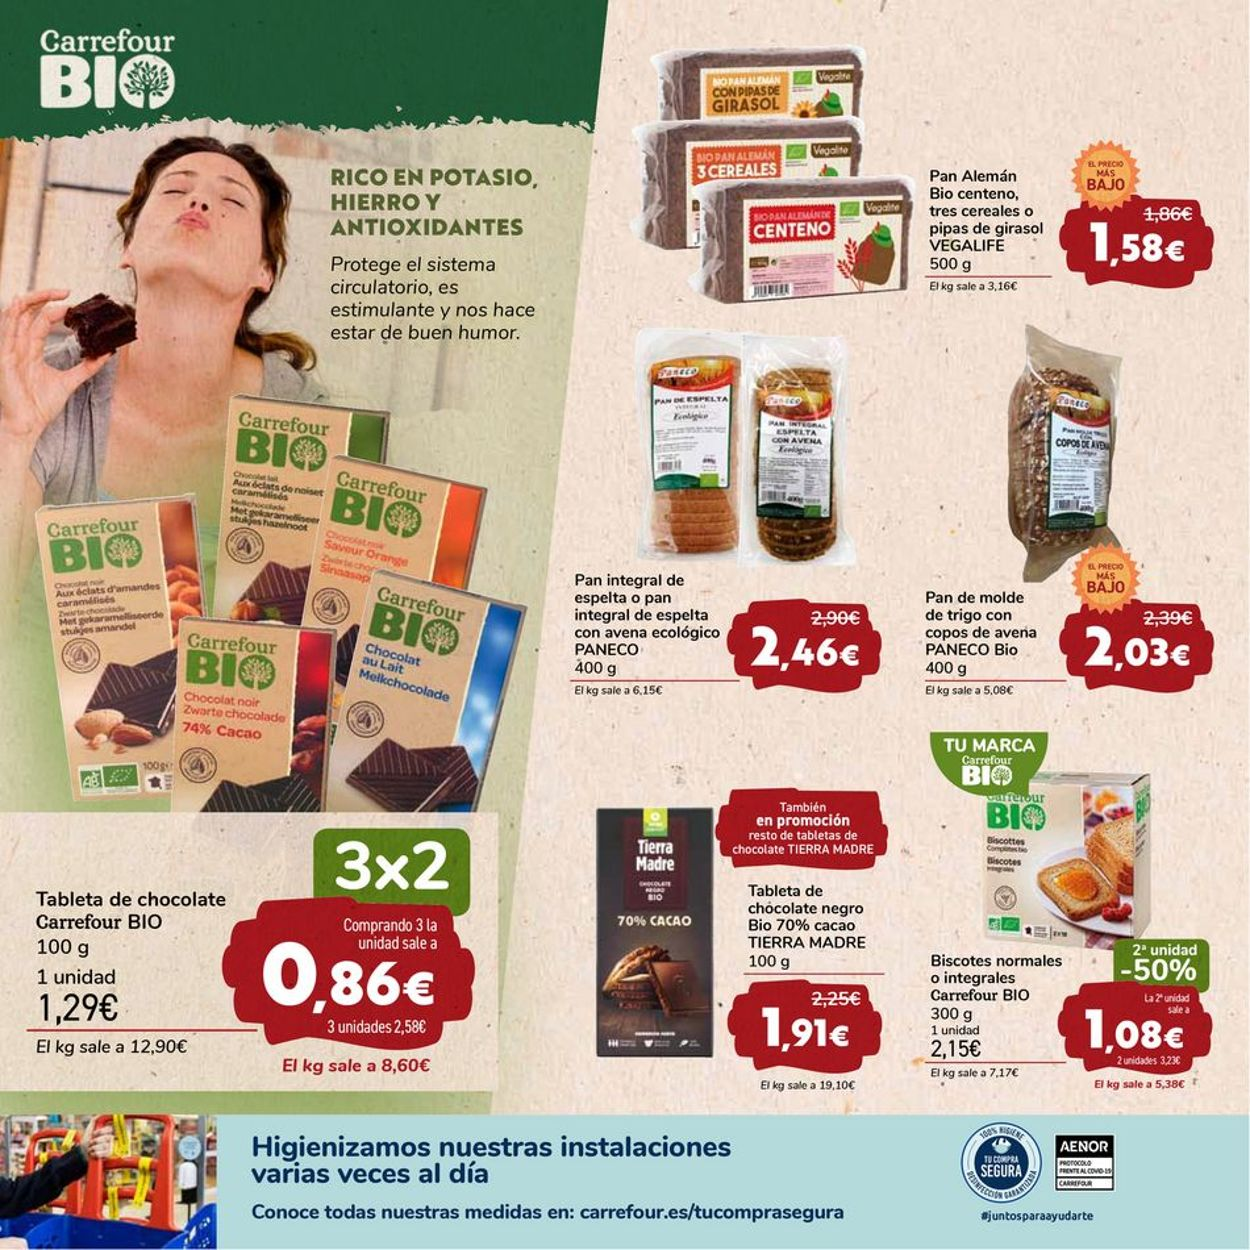 Carrefour BIO Folleto - 18.02-11.03.2021 (Página 20)